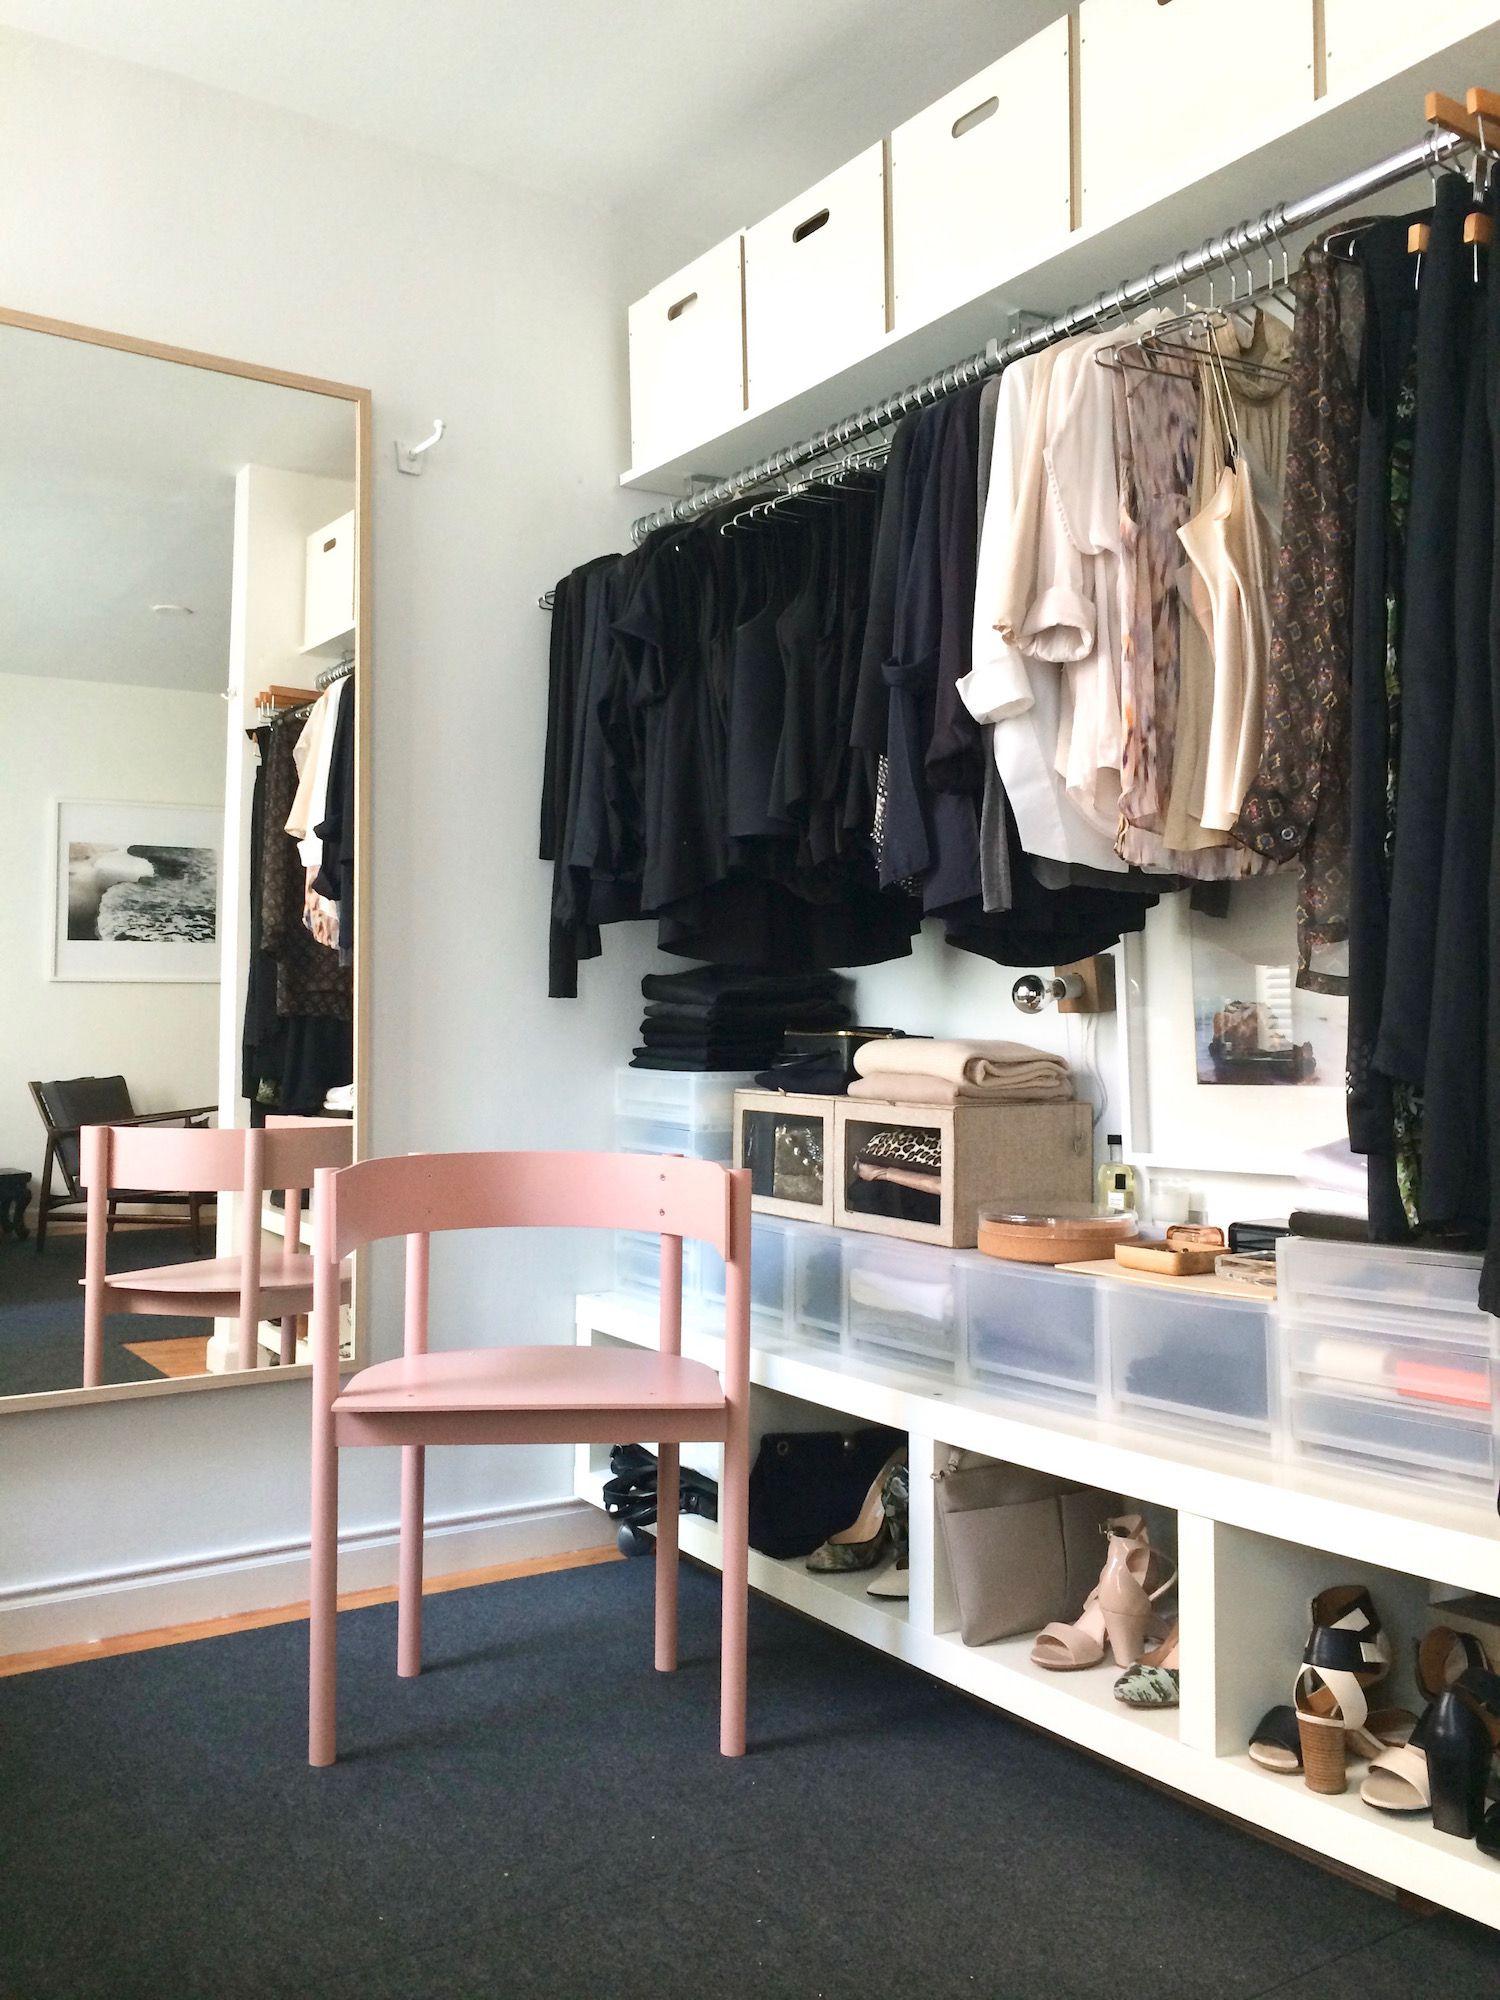 Closet Organization Ideas (11)